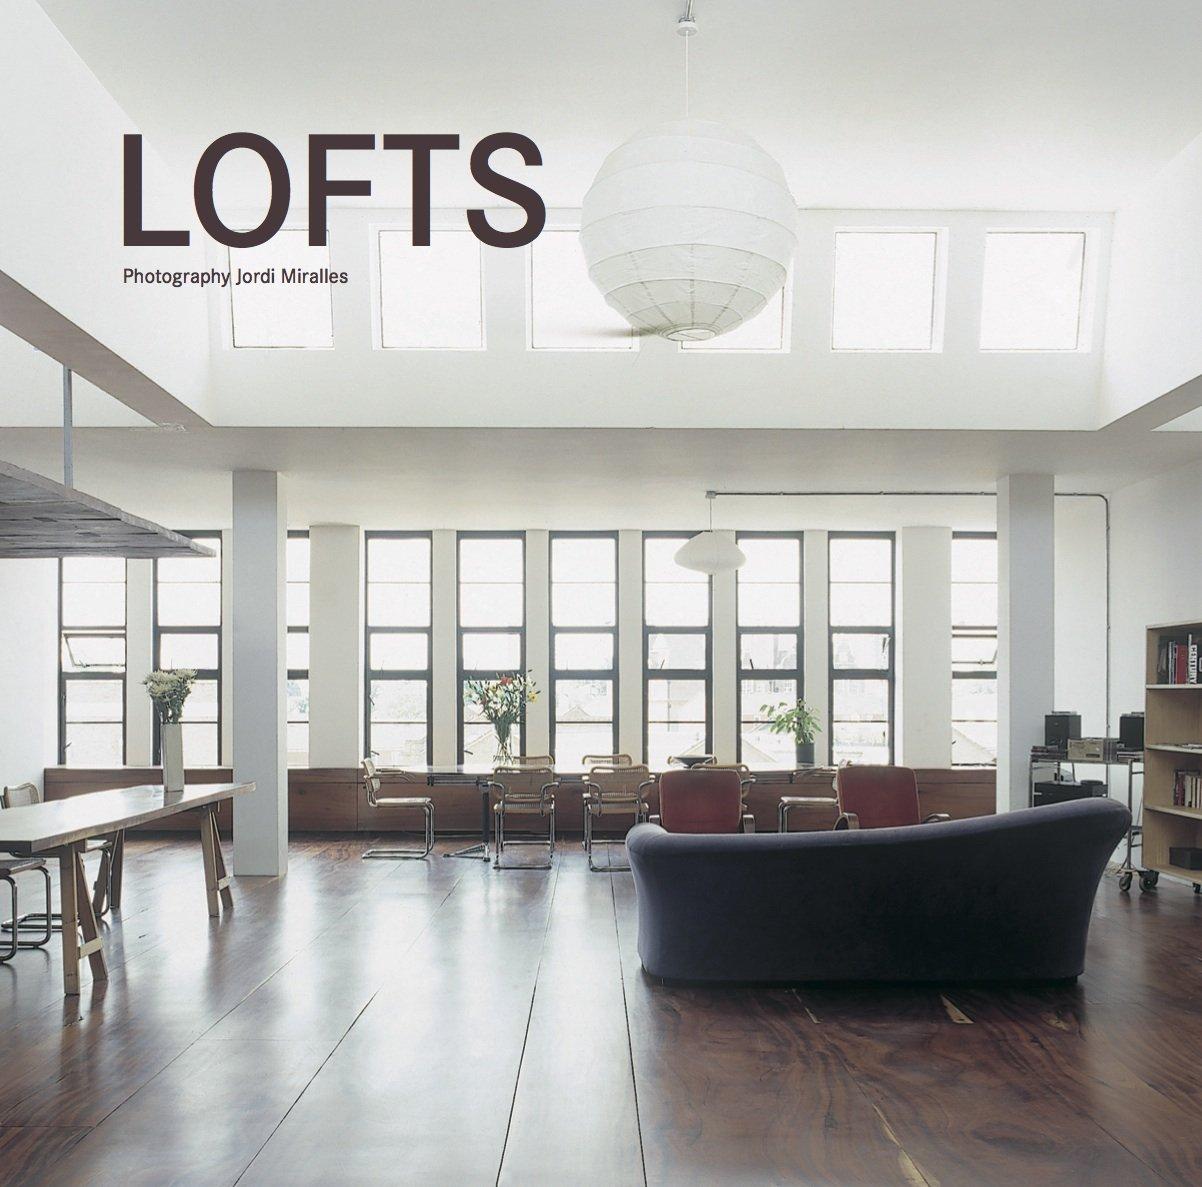 Lofts: Amazon.co.uk: Miralles Jordi: 9783864072178: Books